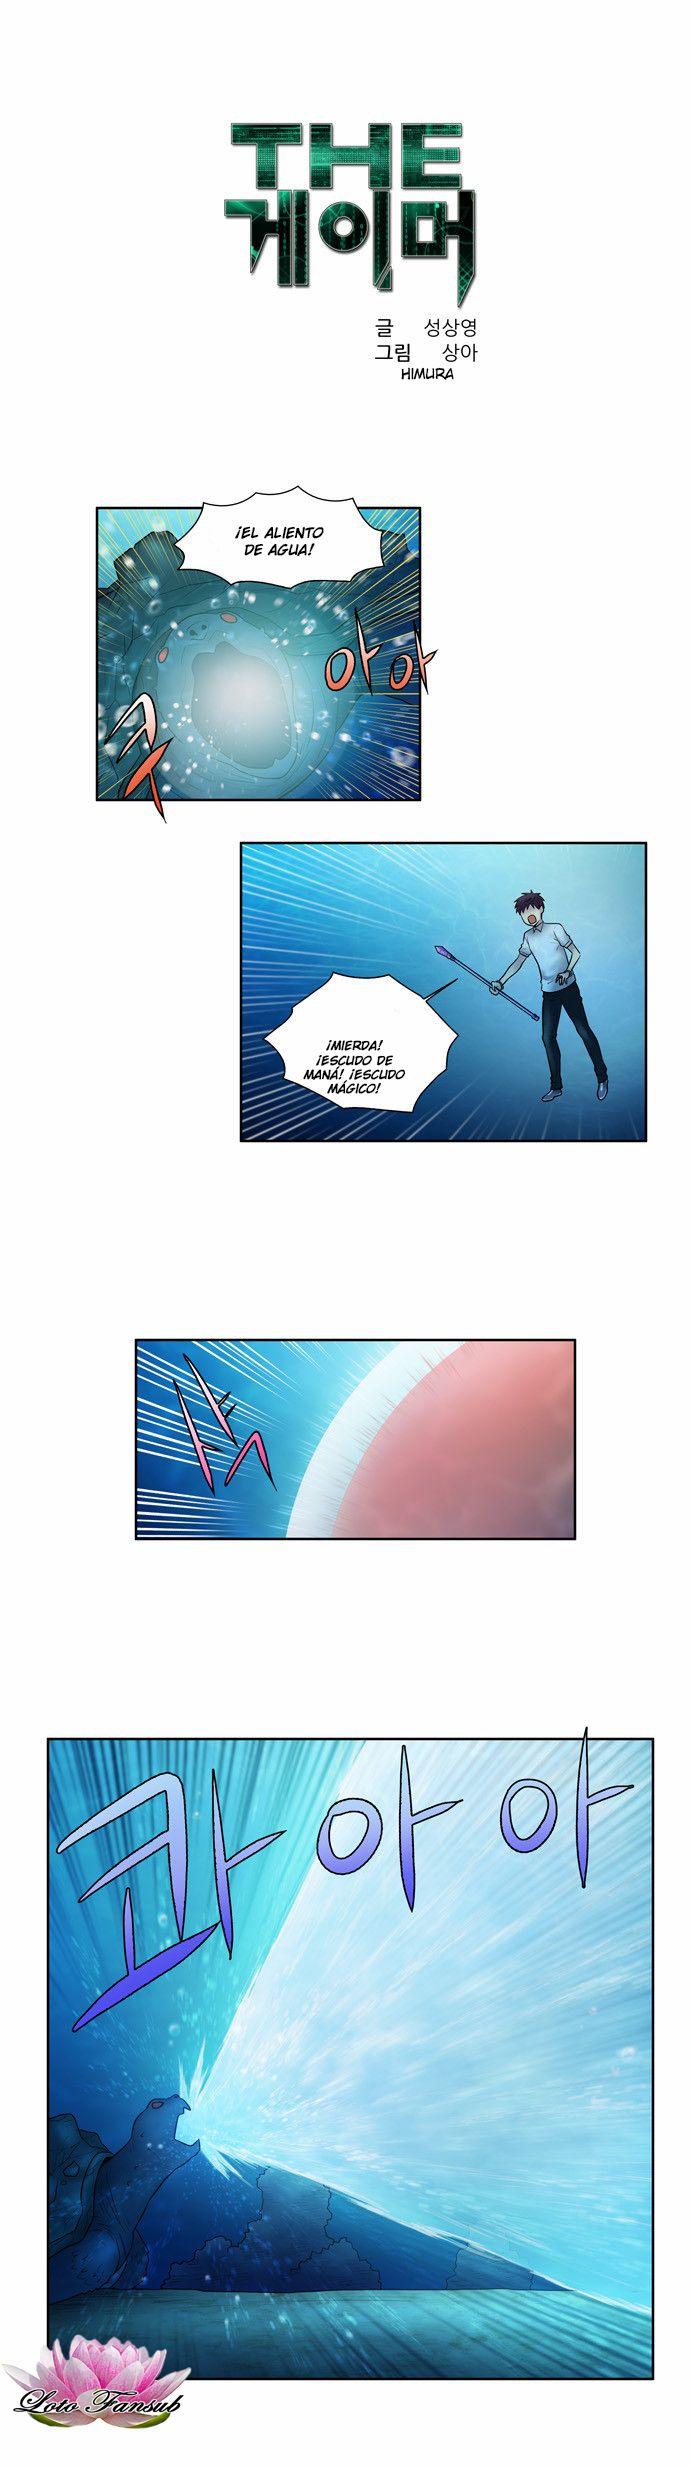 https://c5.ninemanga.com/es_manga/pic2/61/1725/502851/74de1feeaf81492bacfb445d78bac9fb.jpg Page 2